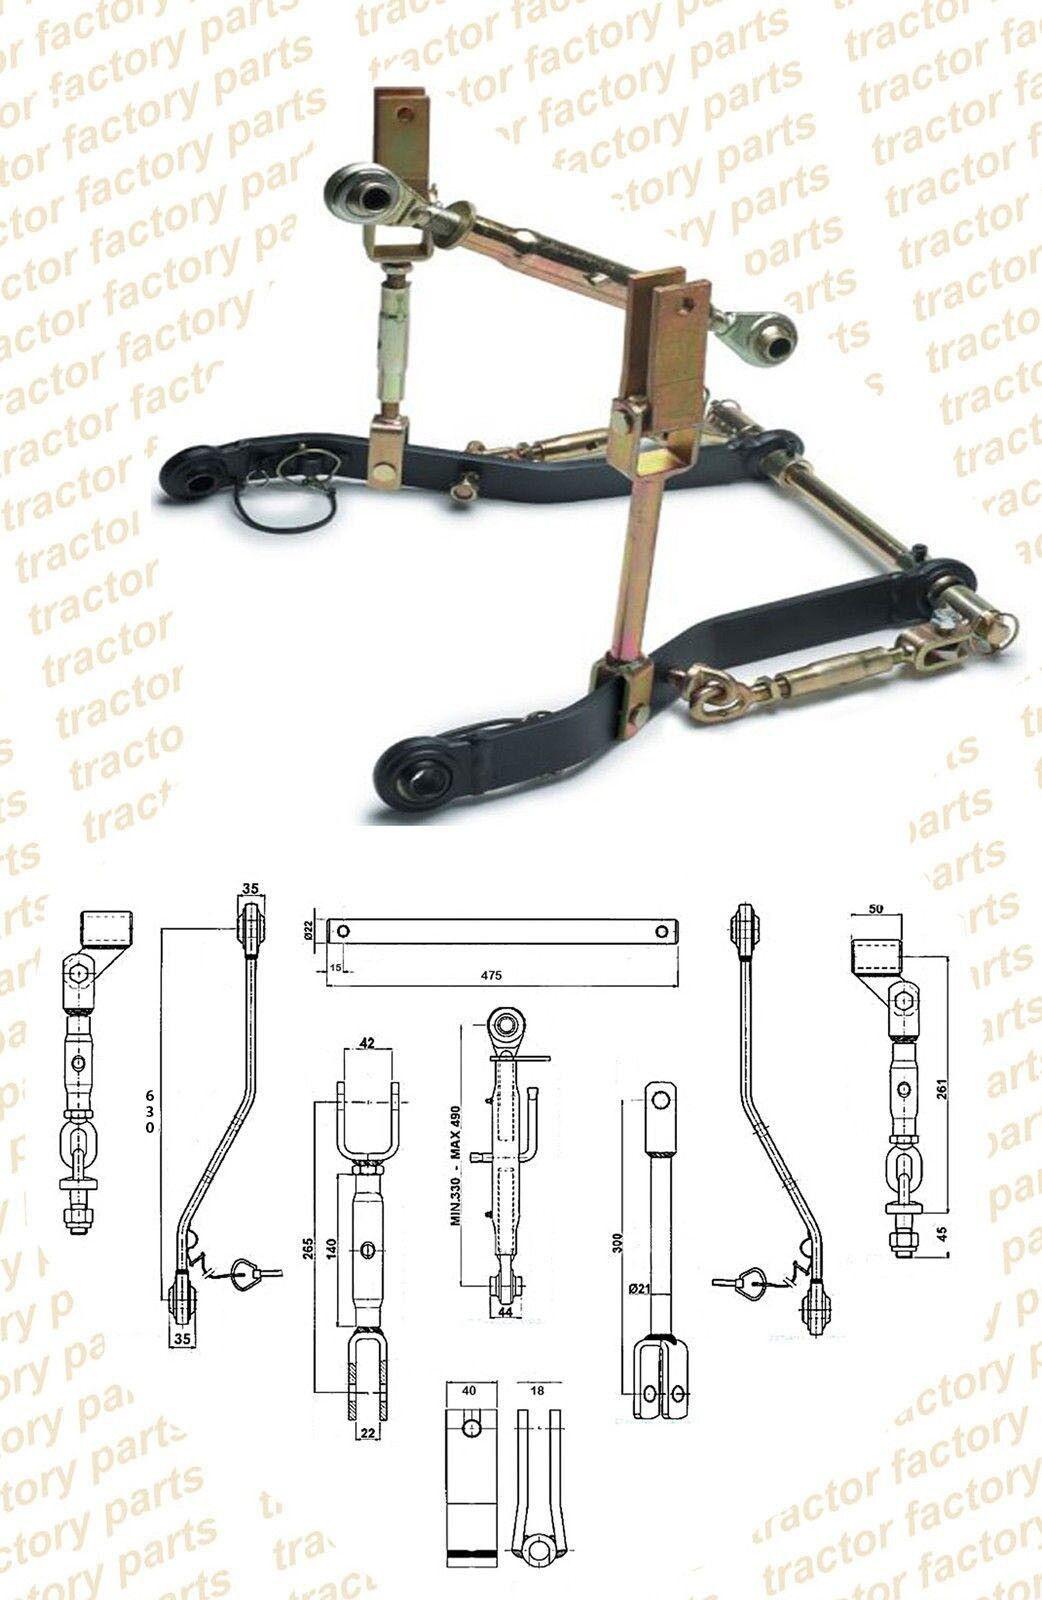 David Brown Wiring Diagram Besides 1210 Ford Tractor Wiring Diagram